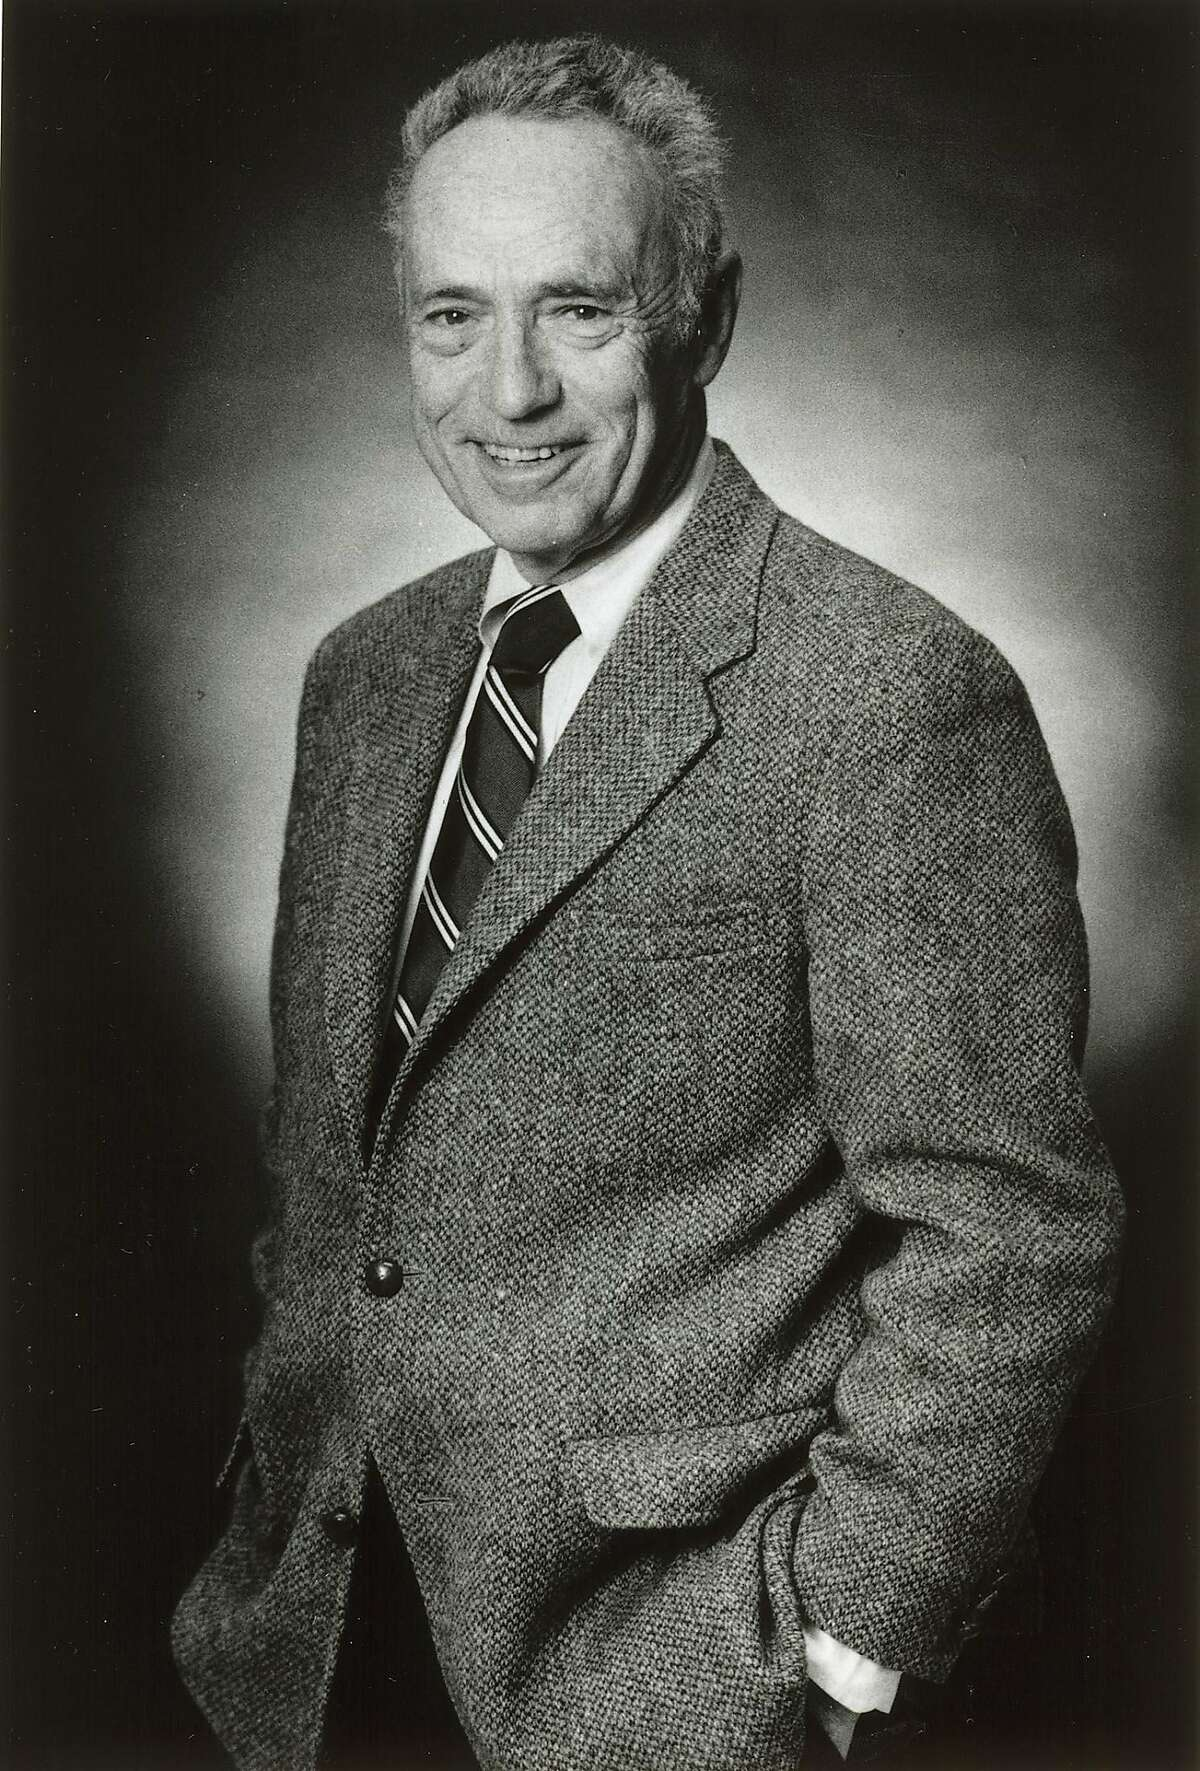 Dave Perlman - October 15, 1986